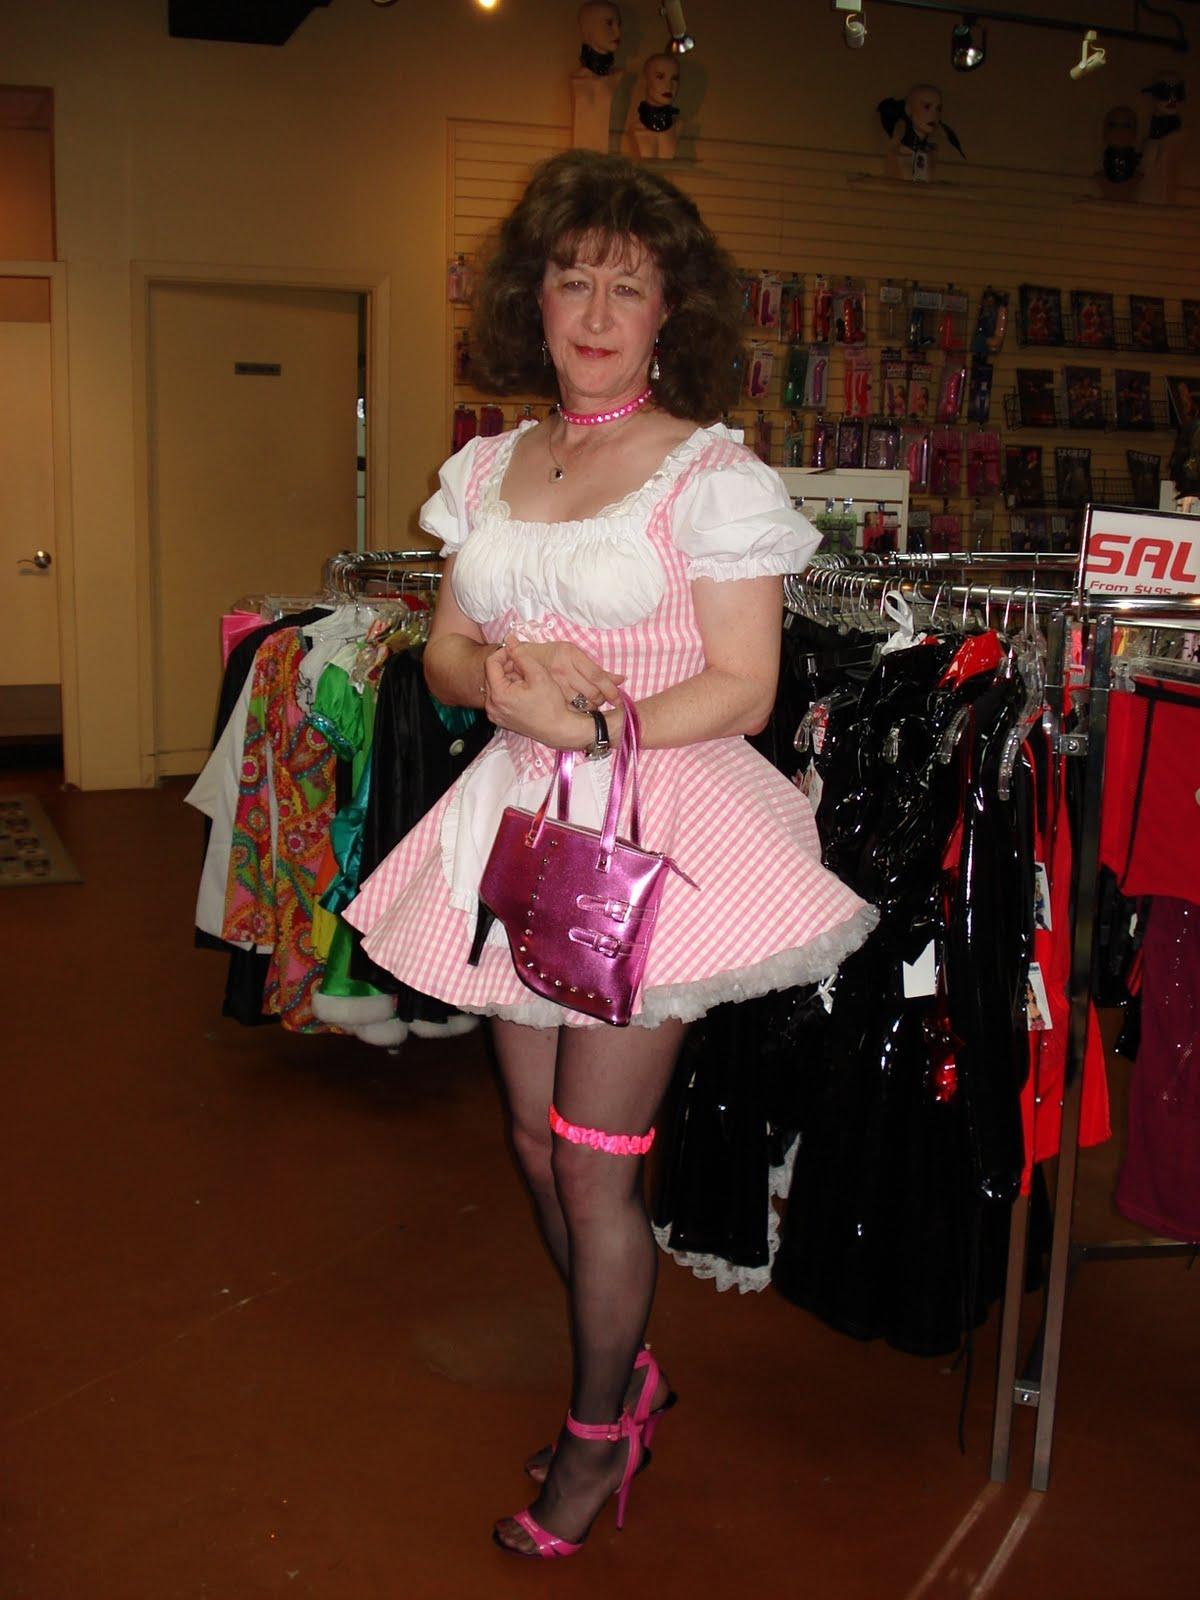 Sissy shopping humiliation